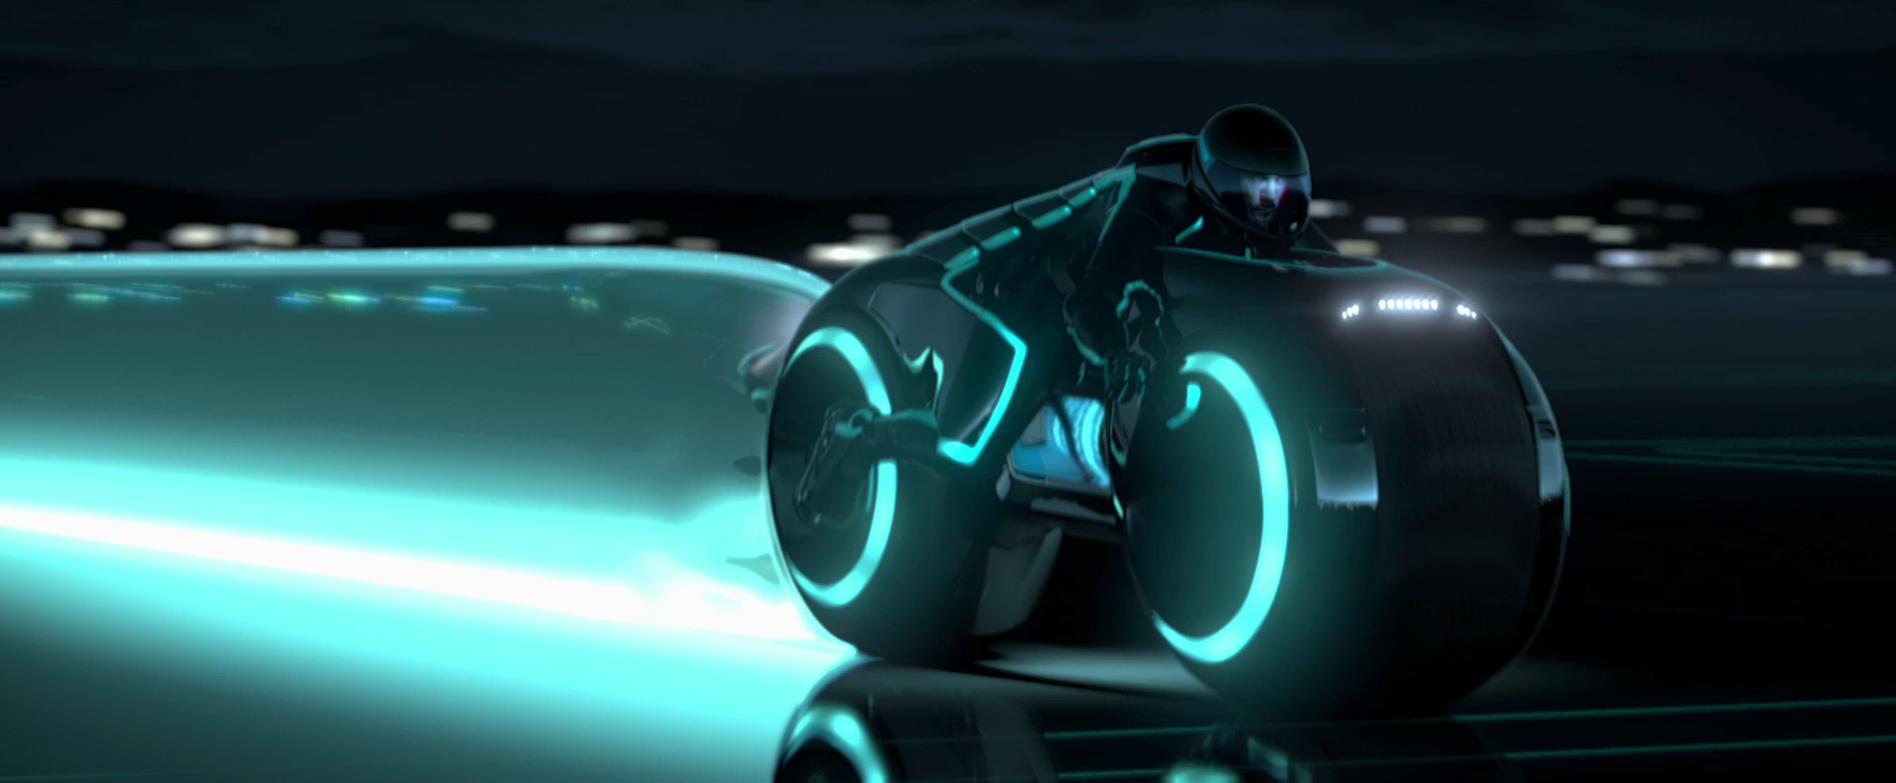 tron-legacy-light-car-4.png